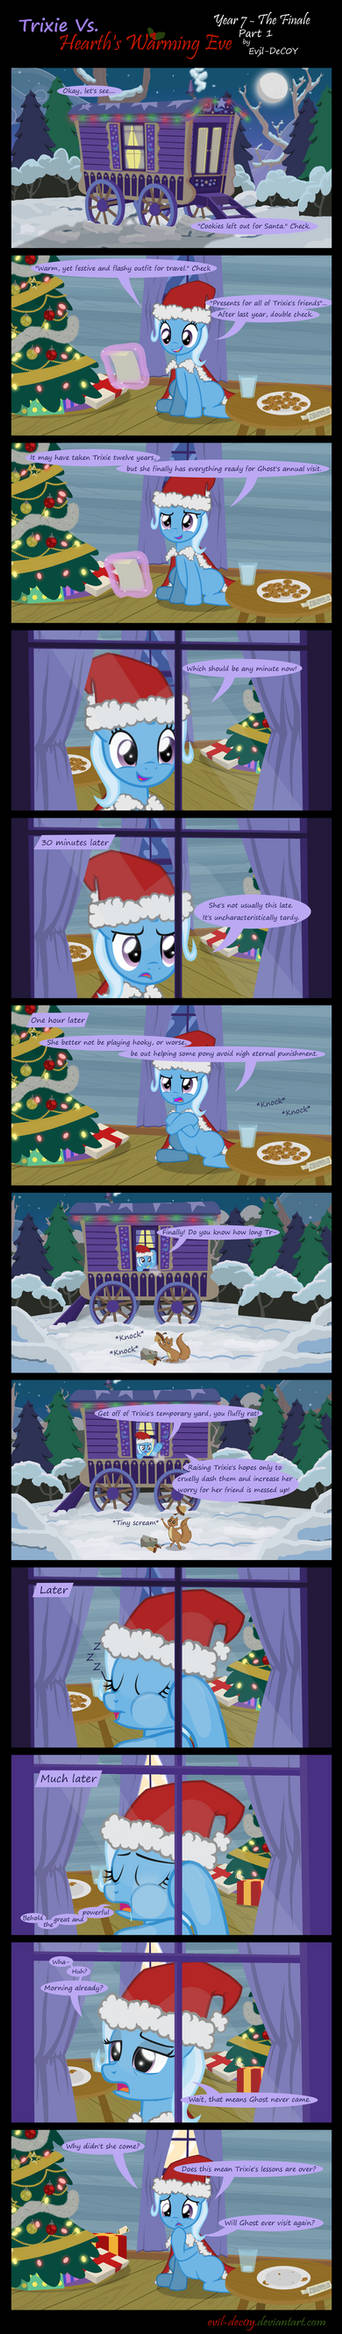 Trixie Vs. Hearth's Warming Eve: Finale (Part 1) by Evil-DeC0Y